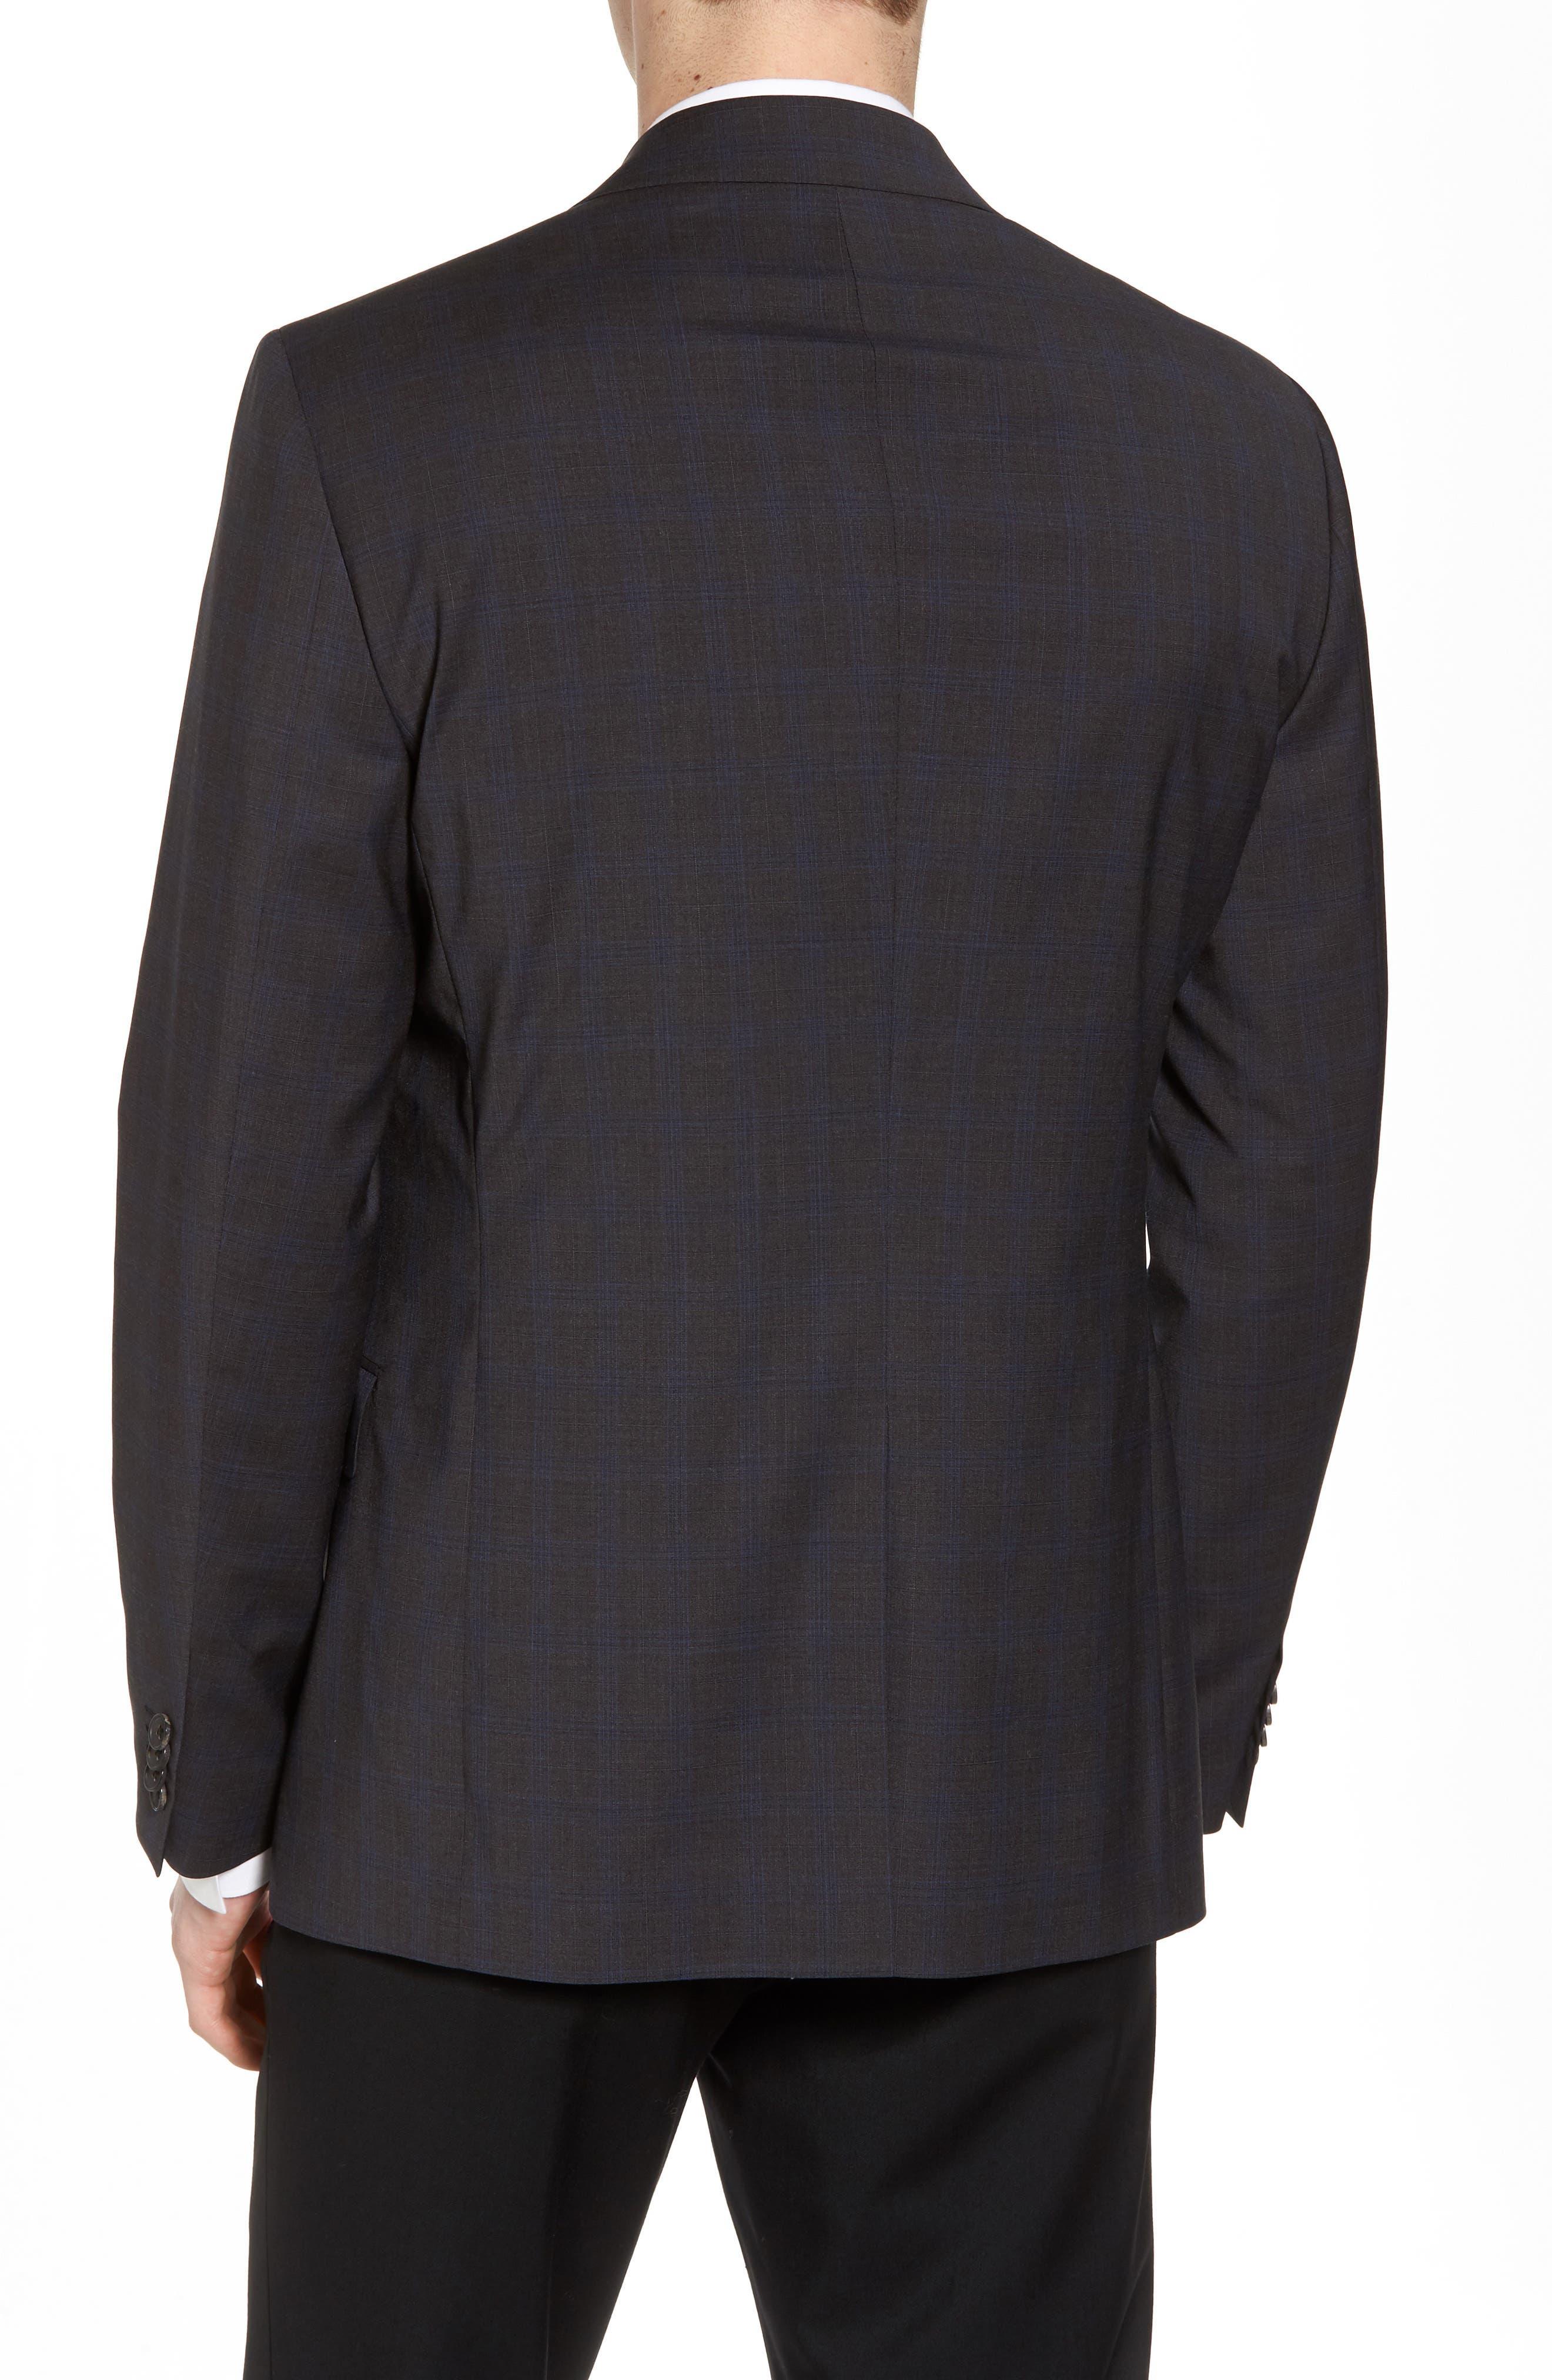 Wellar Grey Blue Plaid Sport Coat,                             Alternate thumbnail 2, color,                             Grey